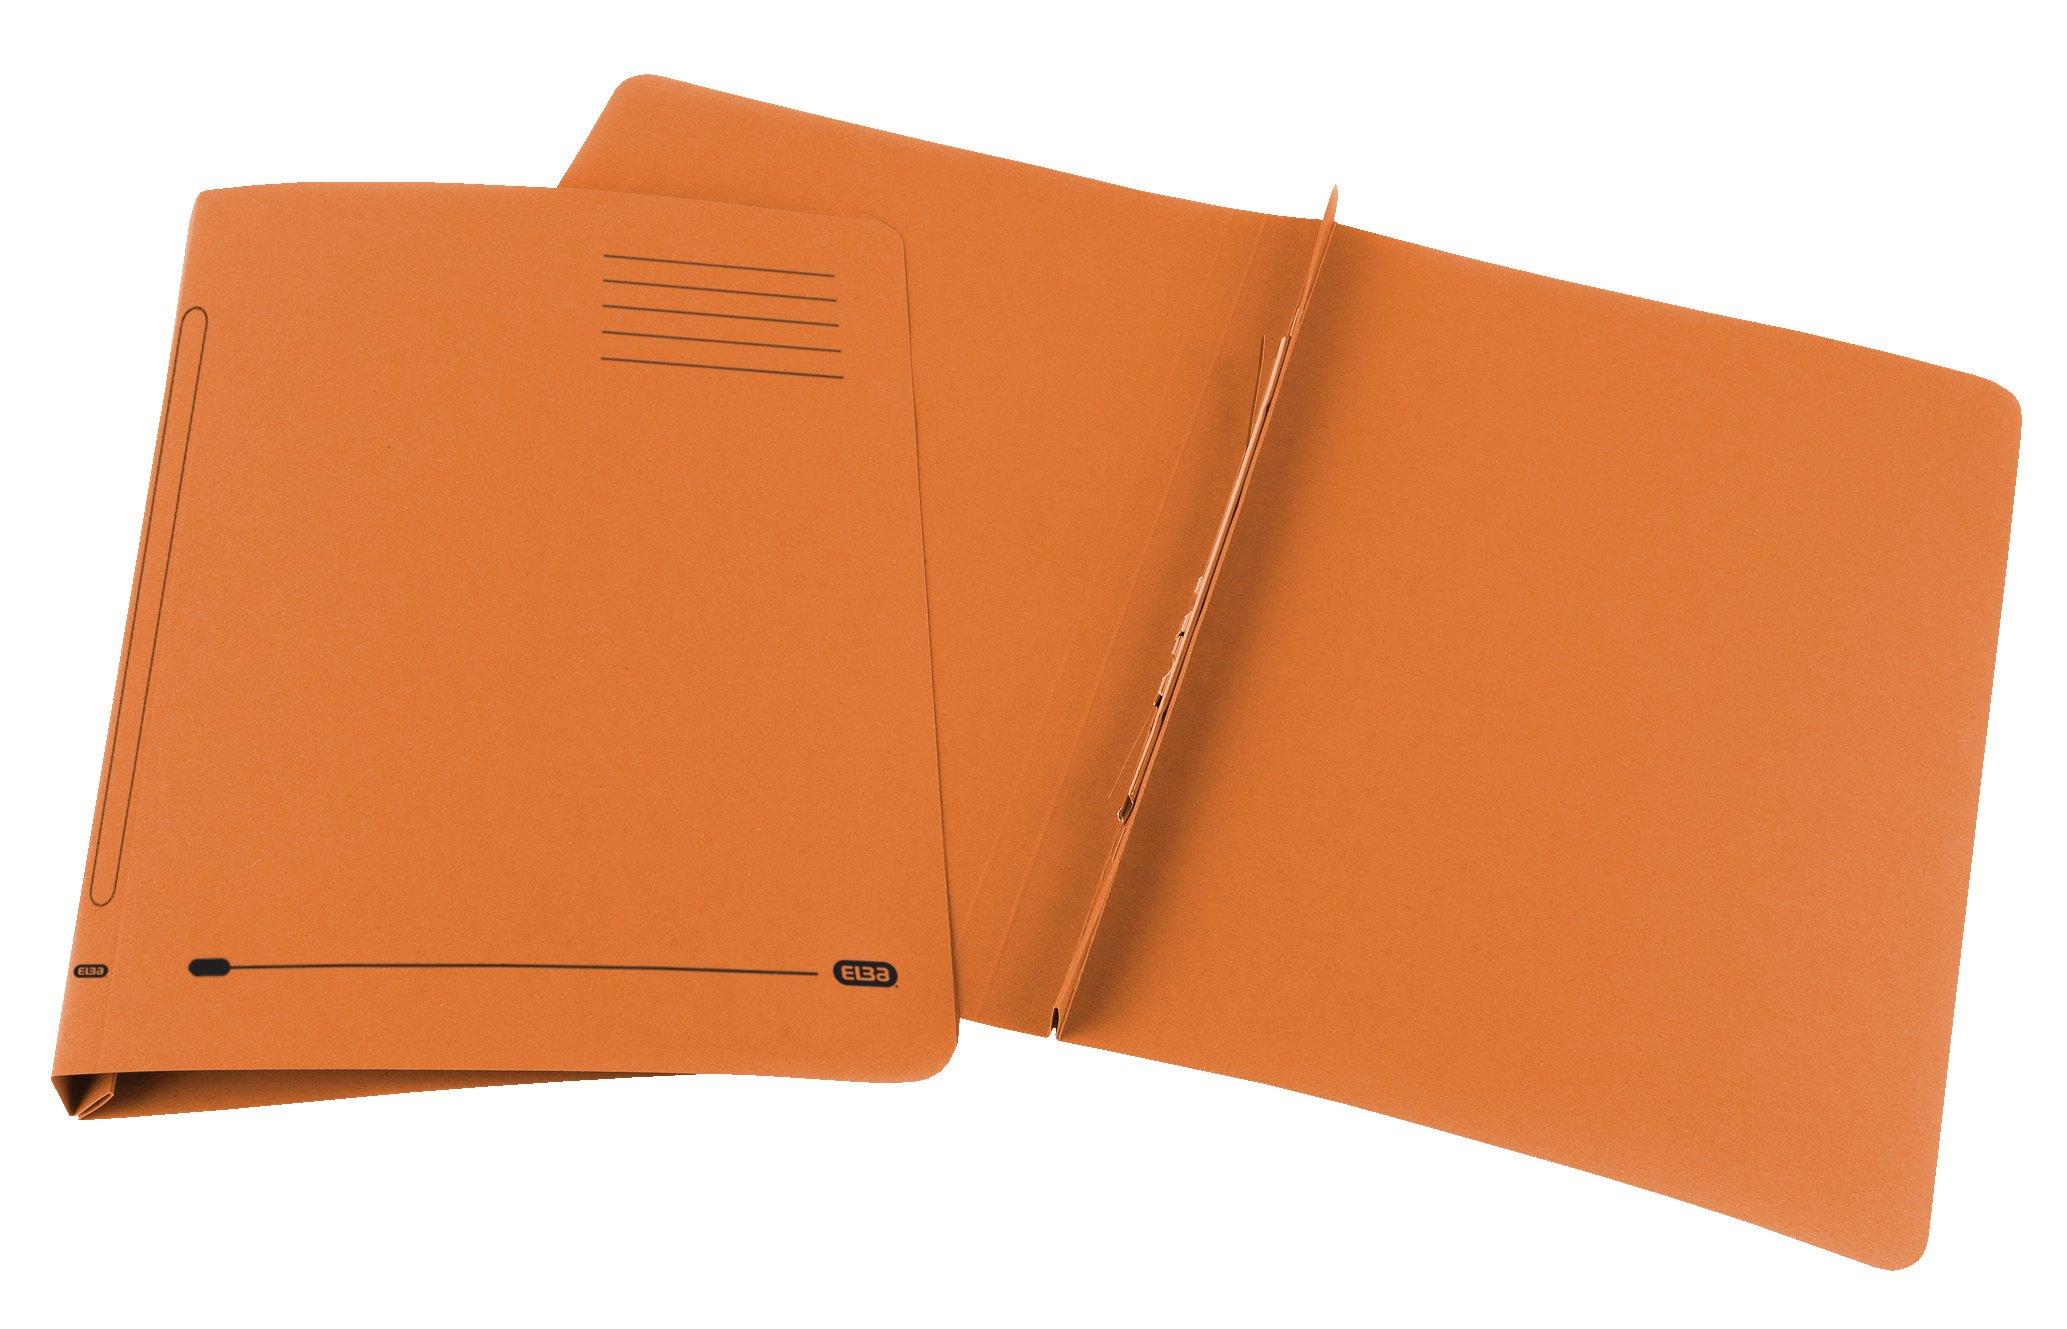 Elba Ashley Flat File 315gsm Capacity 35mm Foolscap Orange Ref 30316 [Pack of 25]